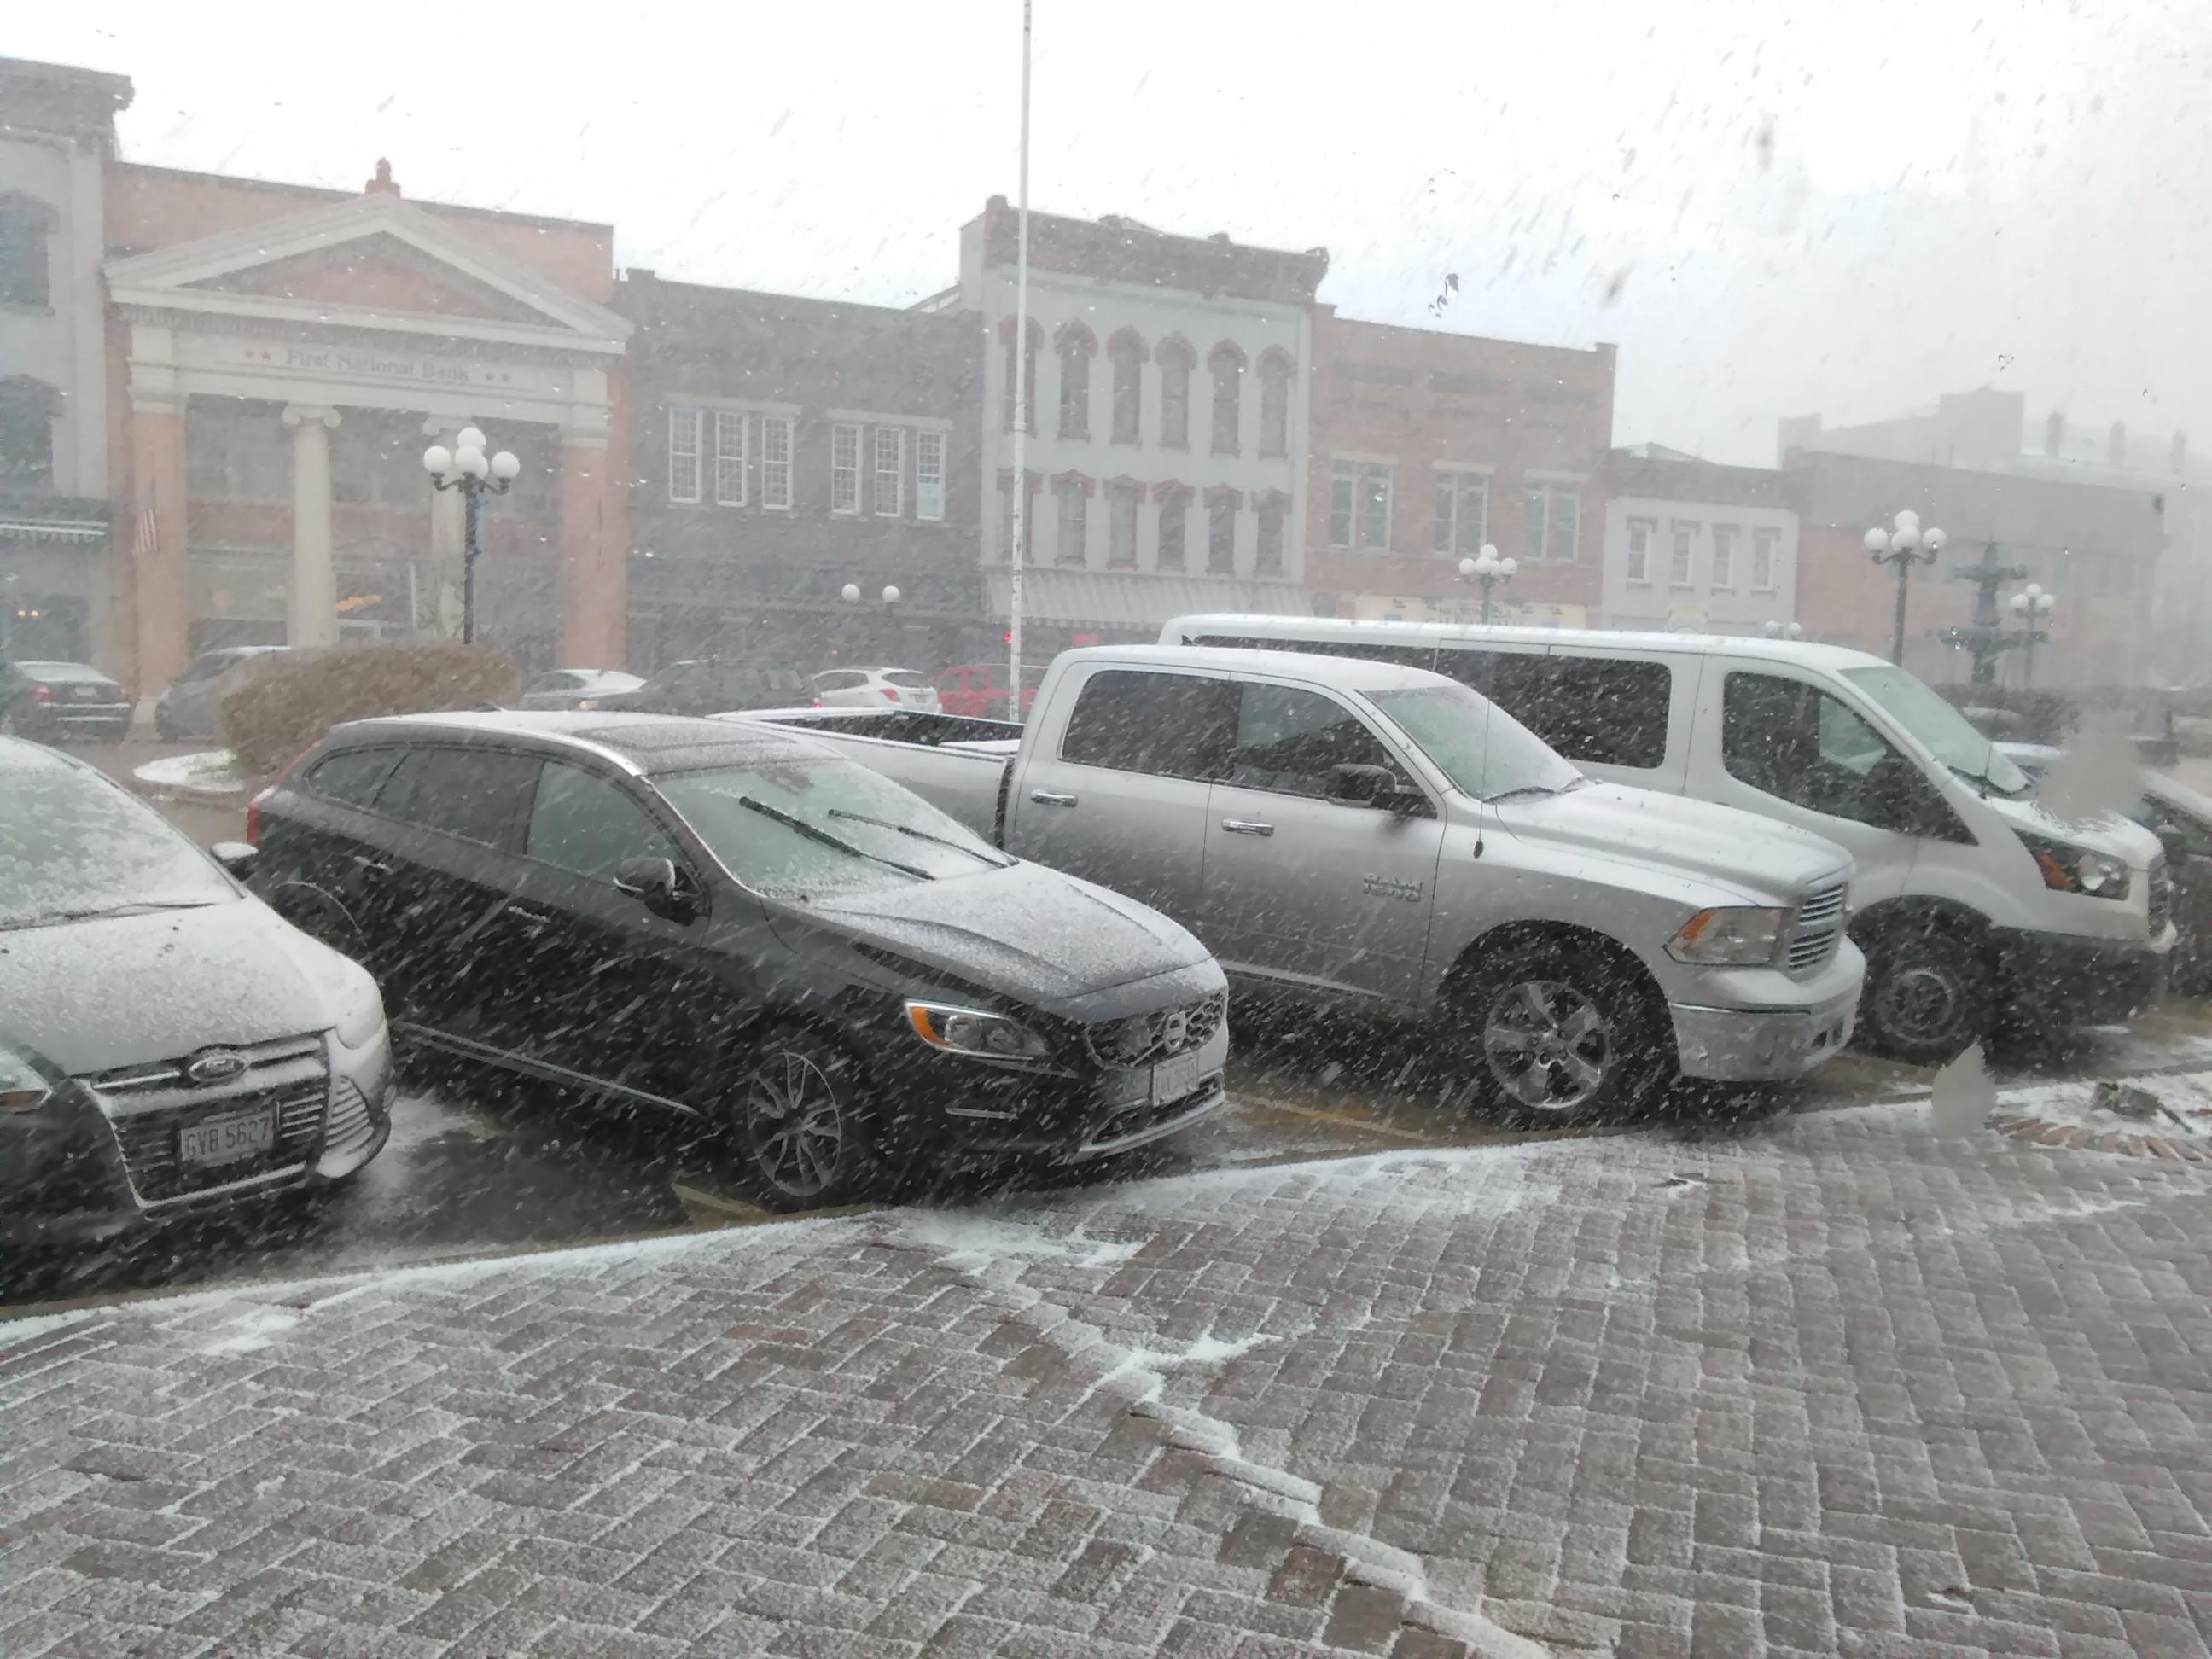 Nelsonville Snow 3-13-2018 1-11-08 PM